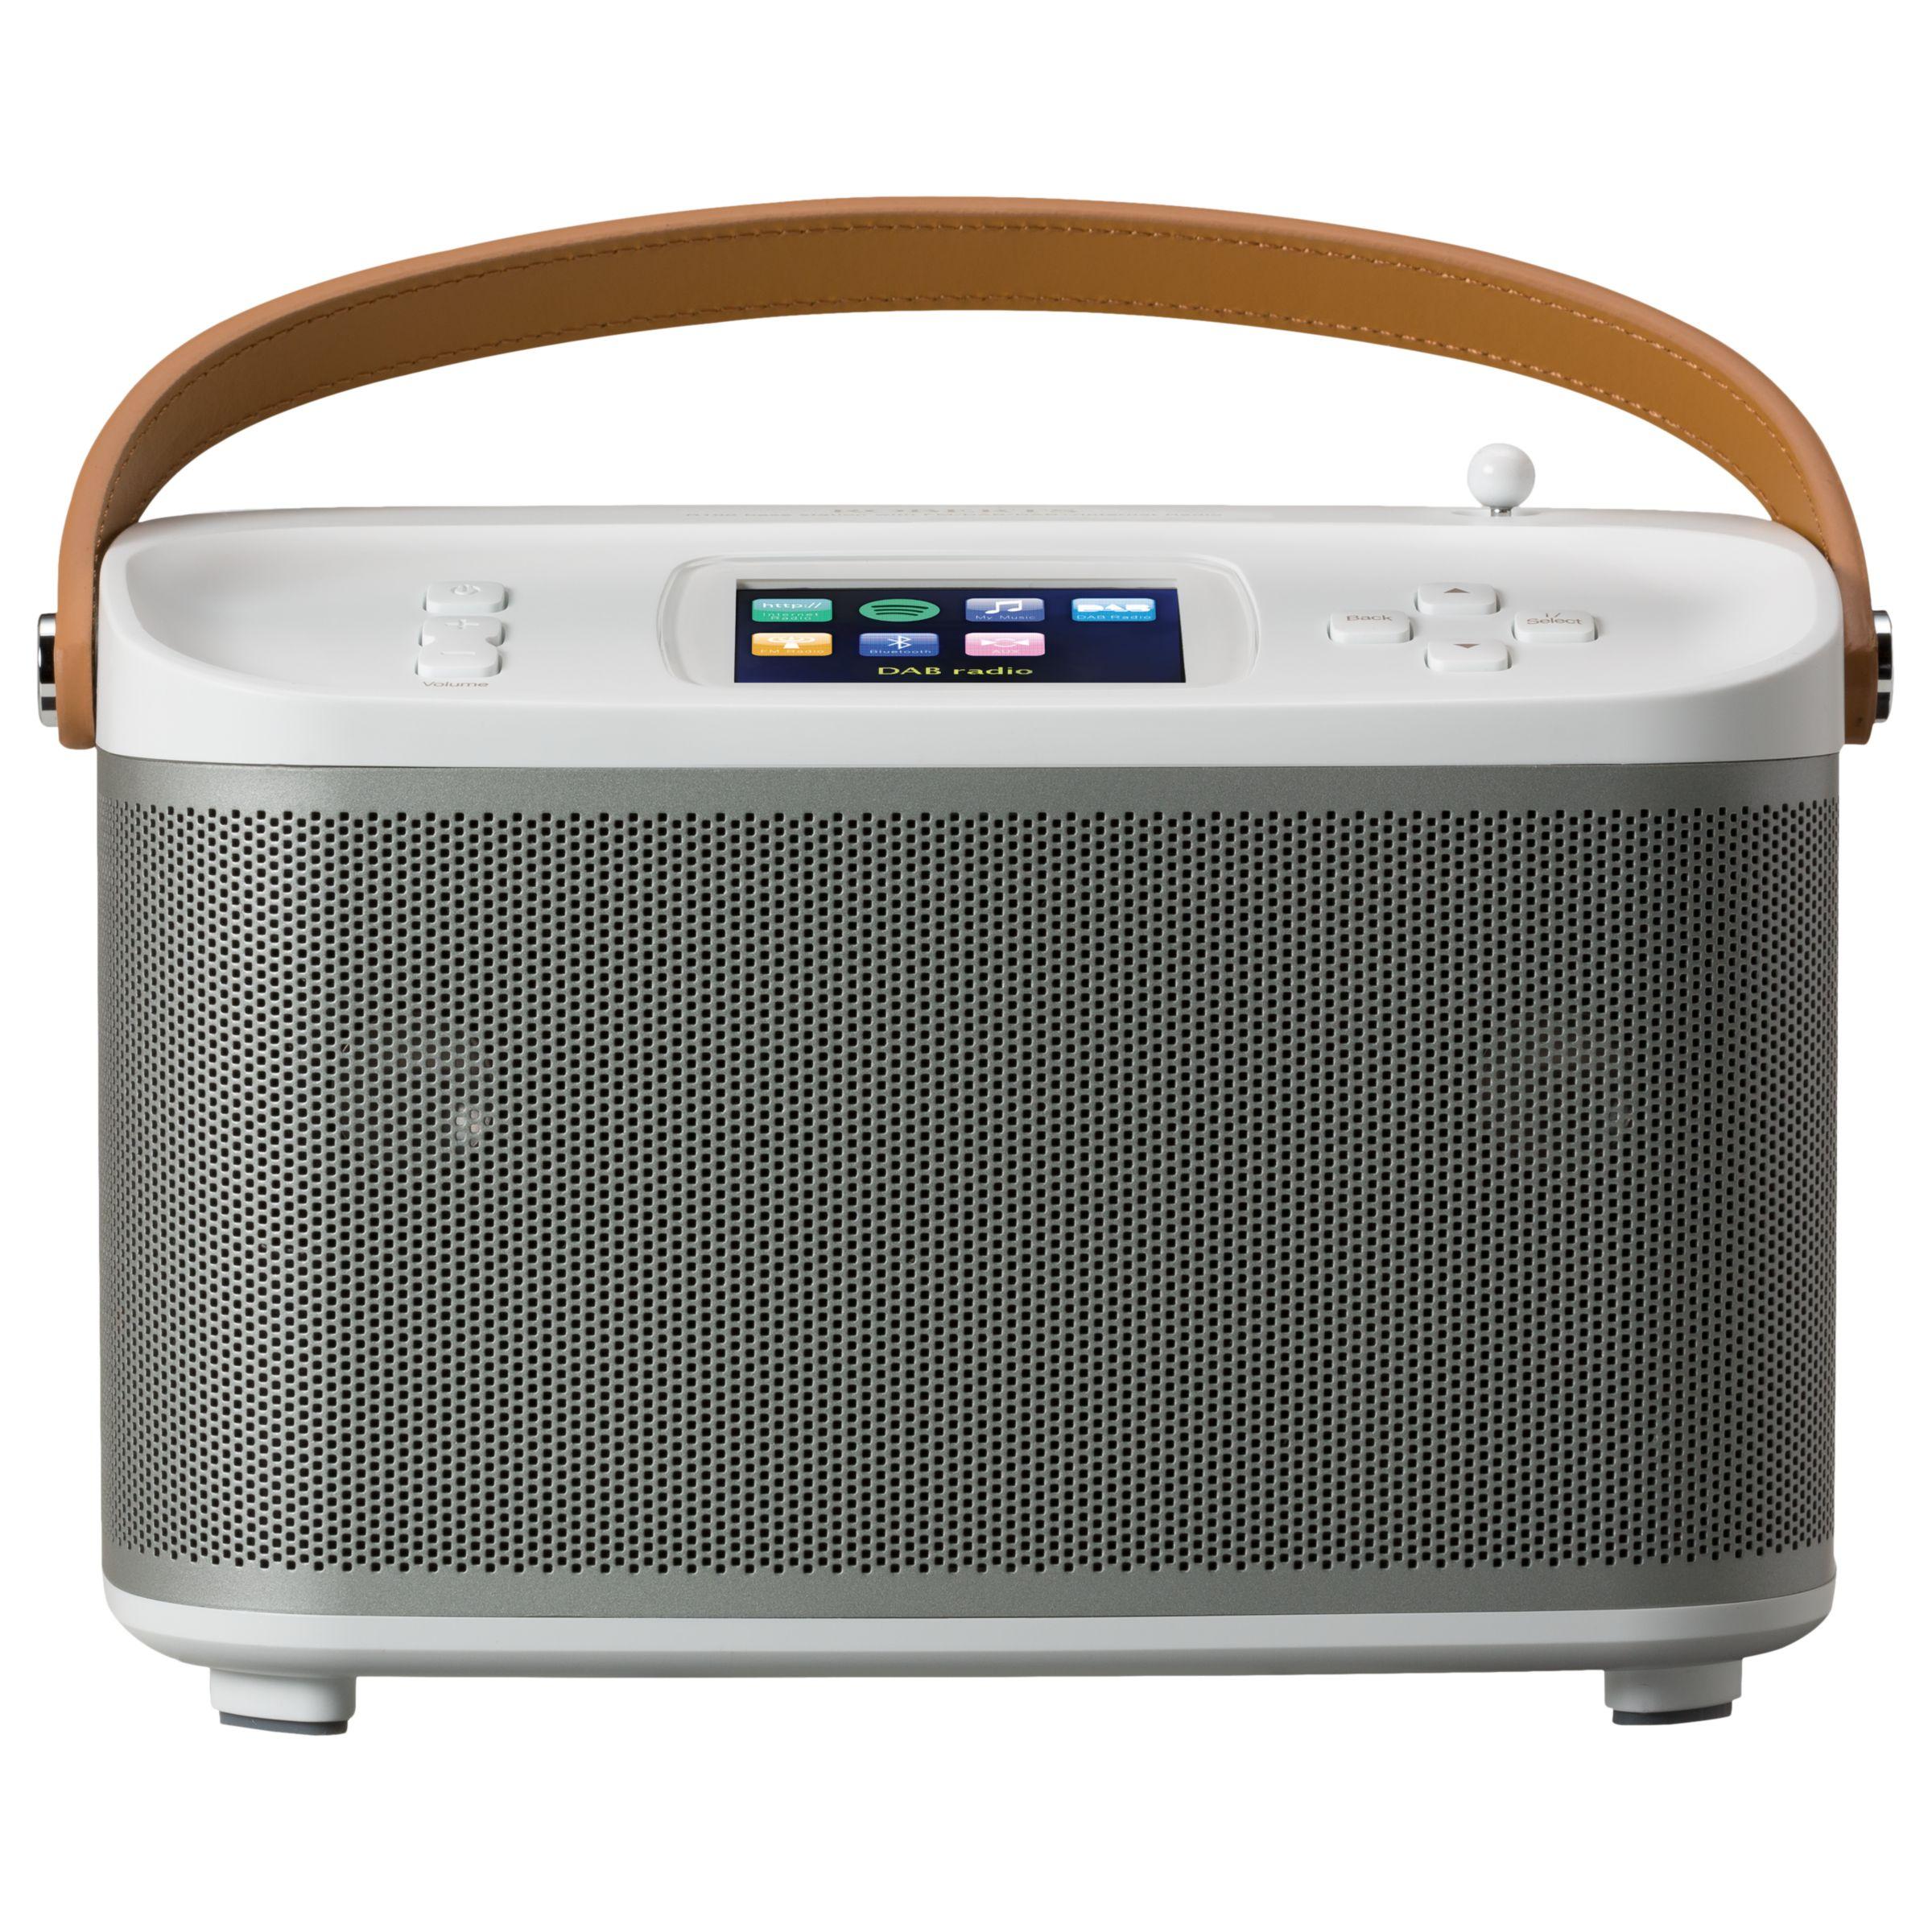 Roberts ROBERTS R100 Multiroom Bluetooth Speaker Base Station with DAB/DAB+/FM Radio